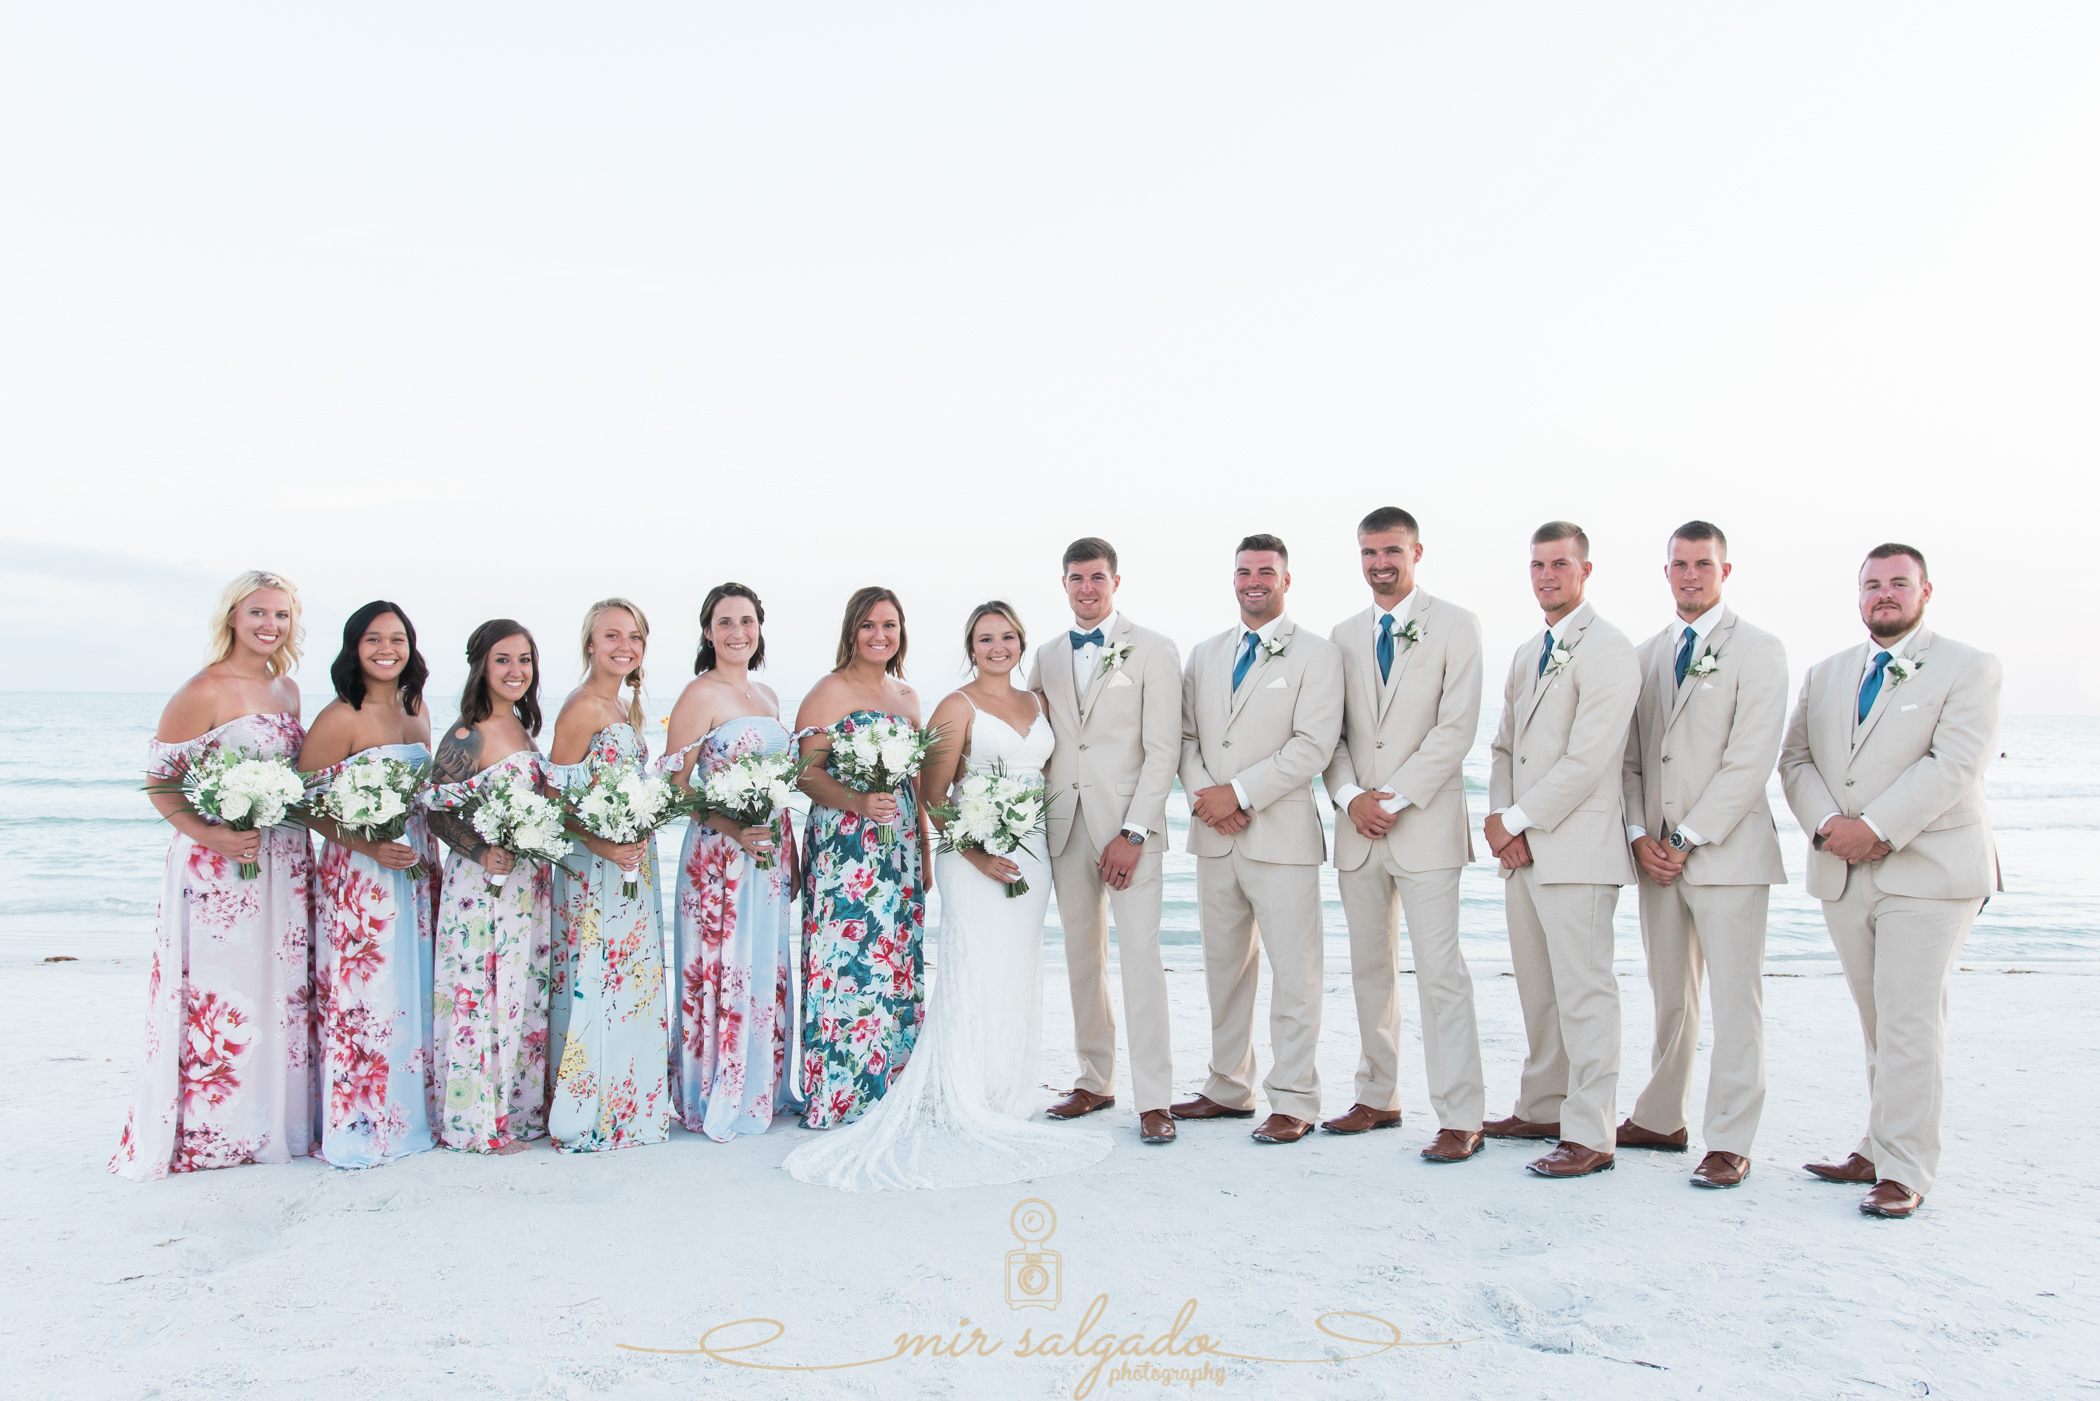 bridal-party-photo, Florida-bridal-party, Destination-wedding-photo